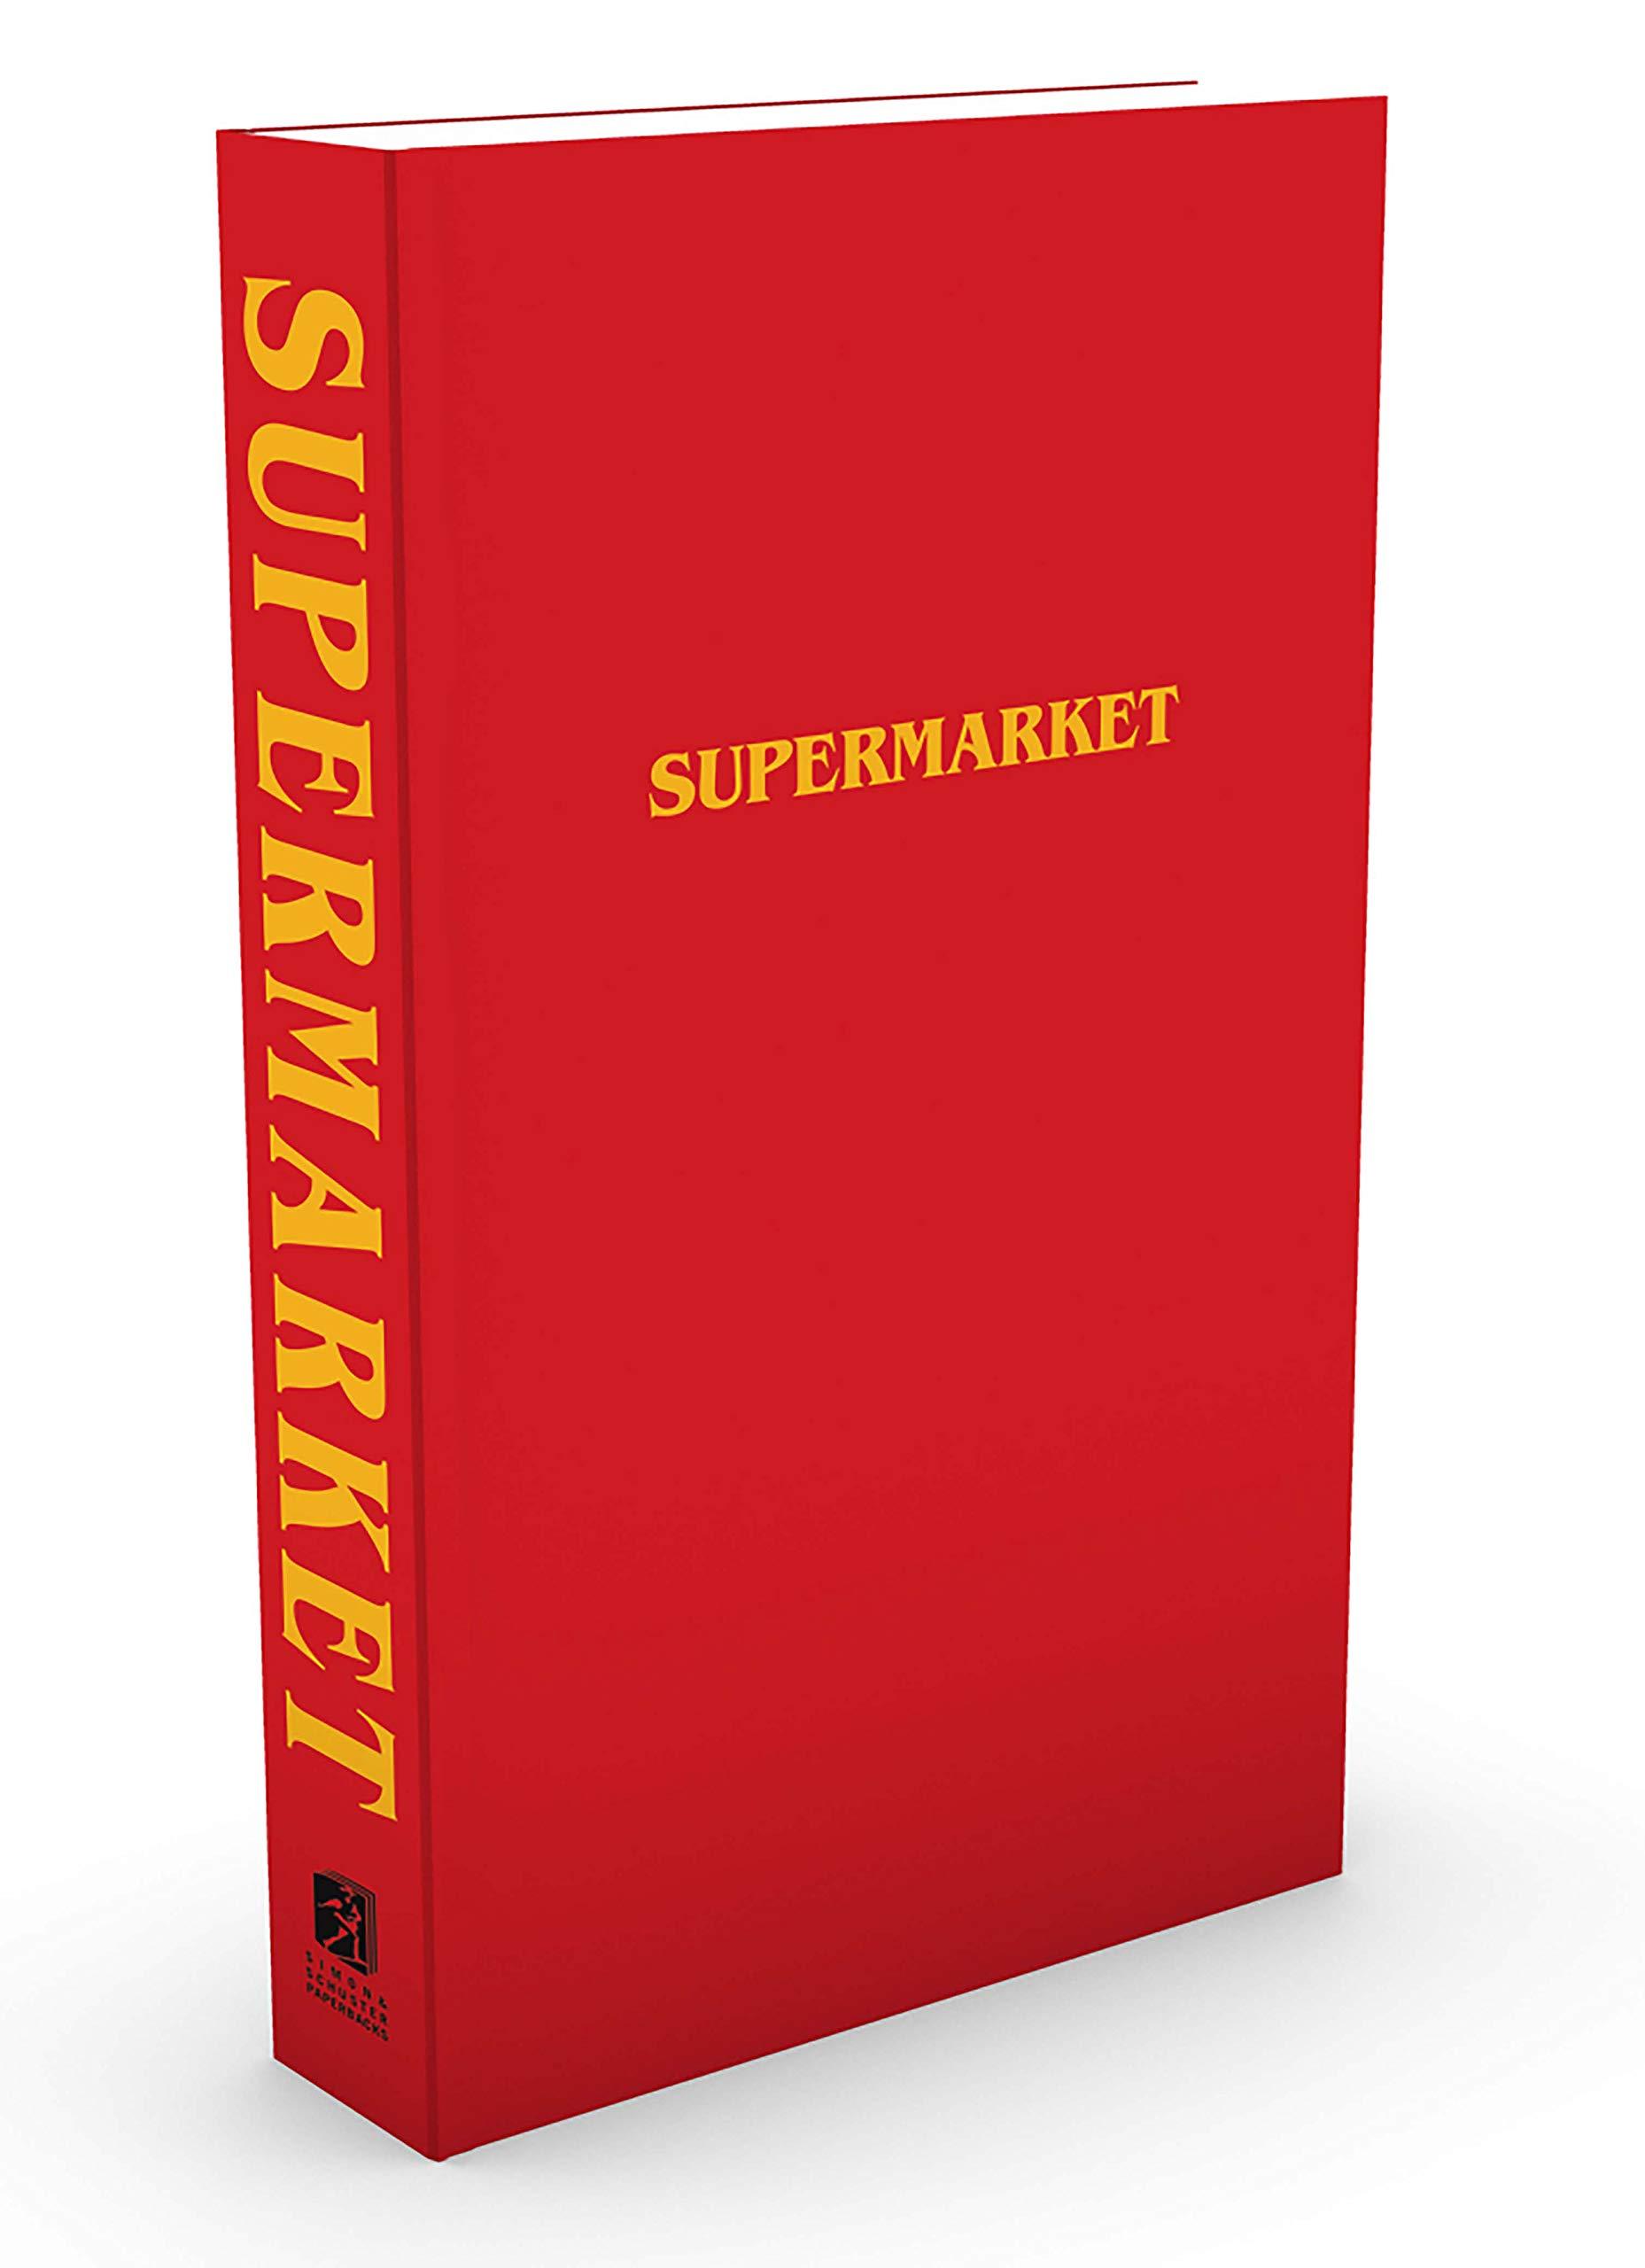 Buy Supermarket Now!